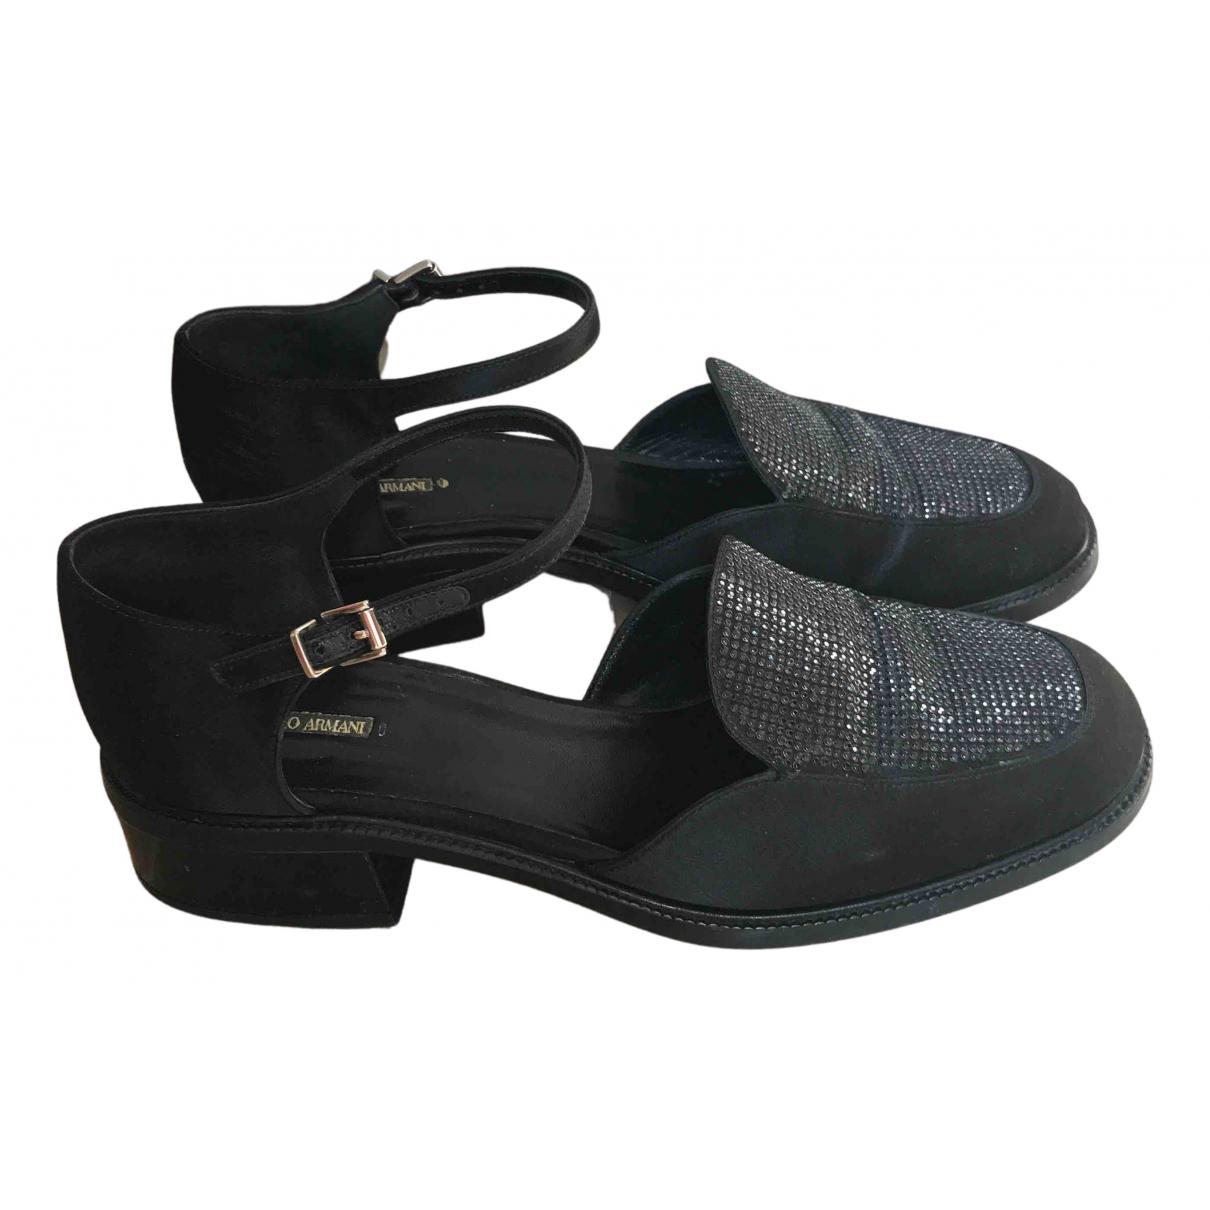 Giorgio Armani N Black Cloth Flats for Women 37.5 EU